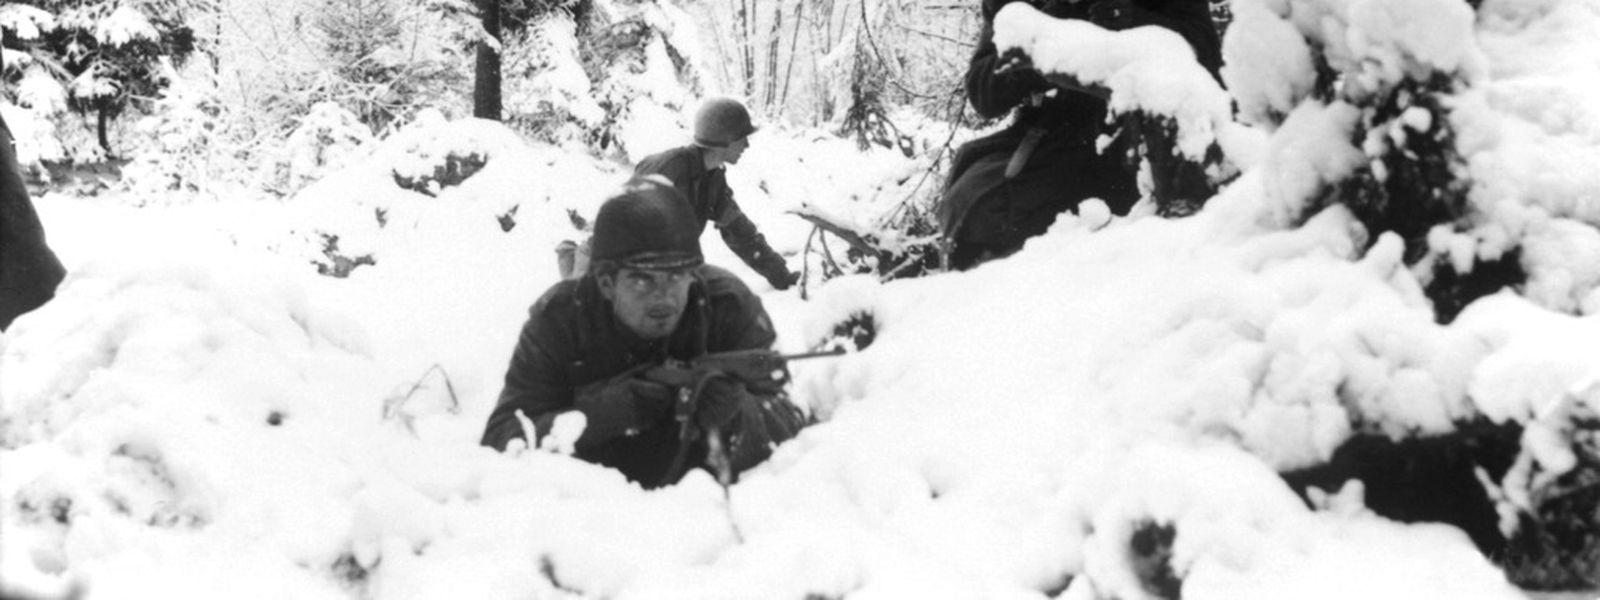 Amerikanische Soldaten in den belgischen Ardennen.